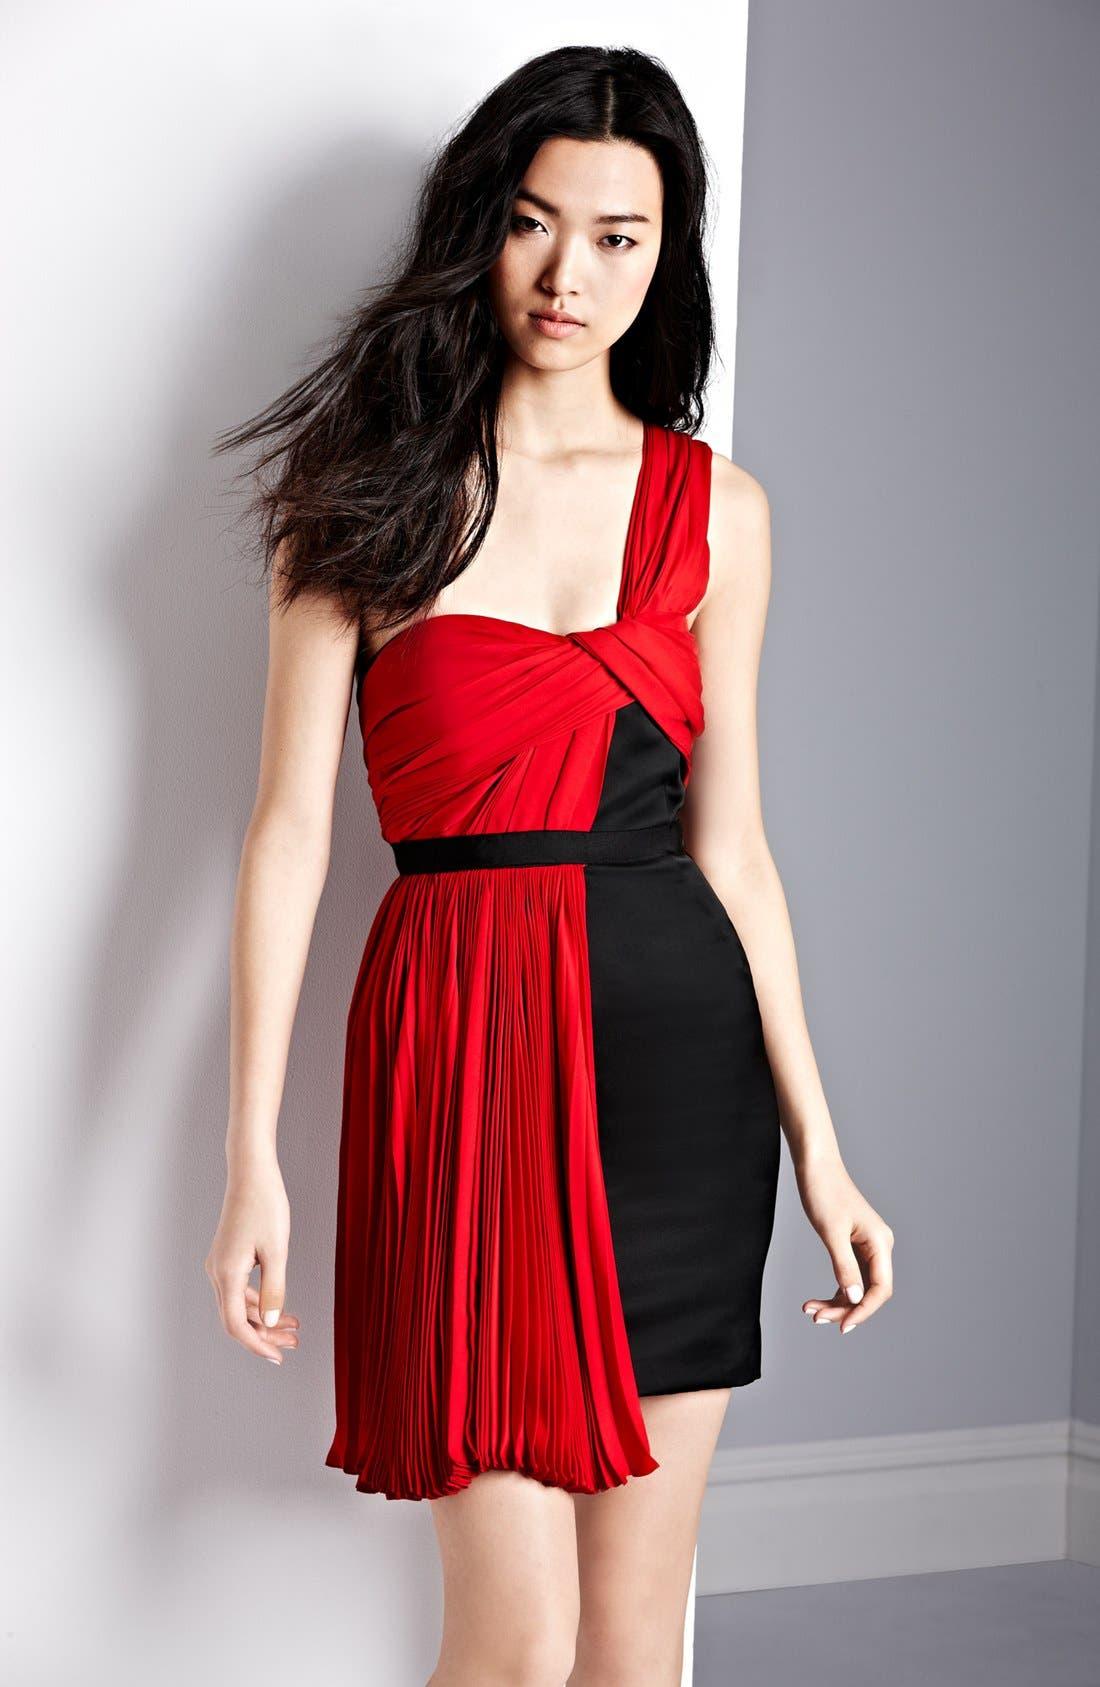 Main Image - Jason Wu Dress & Accessories